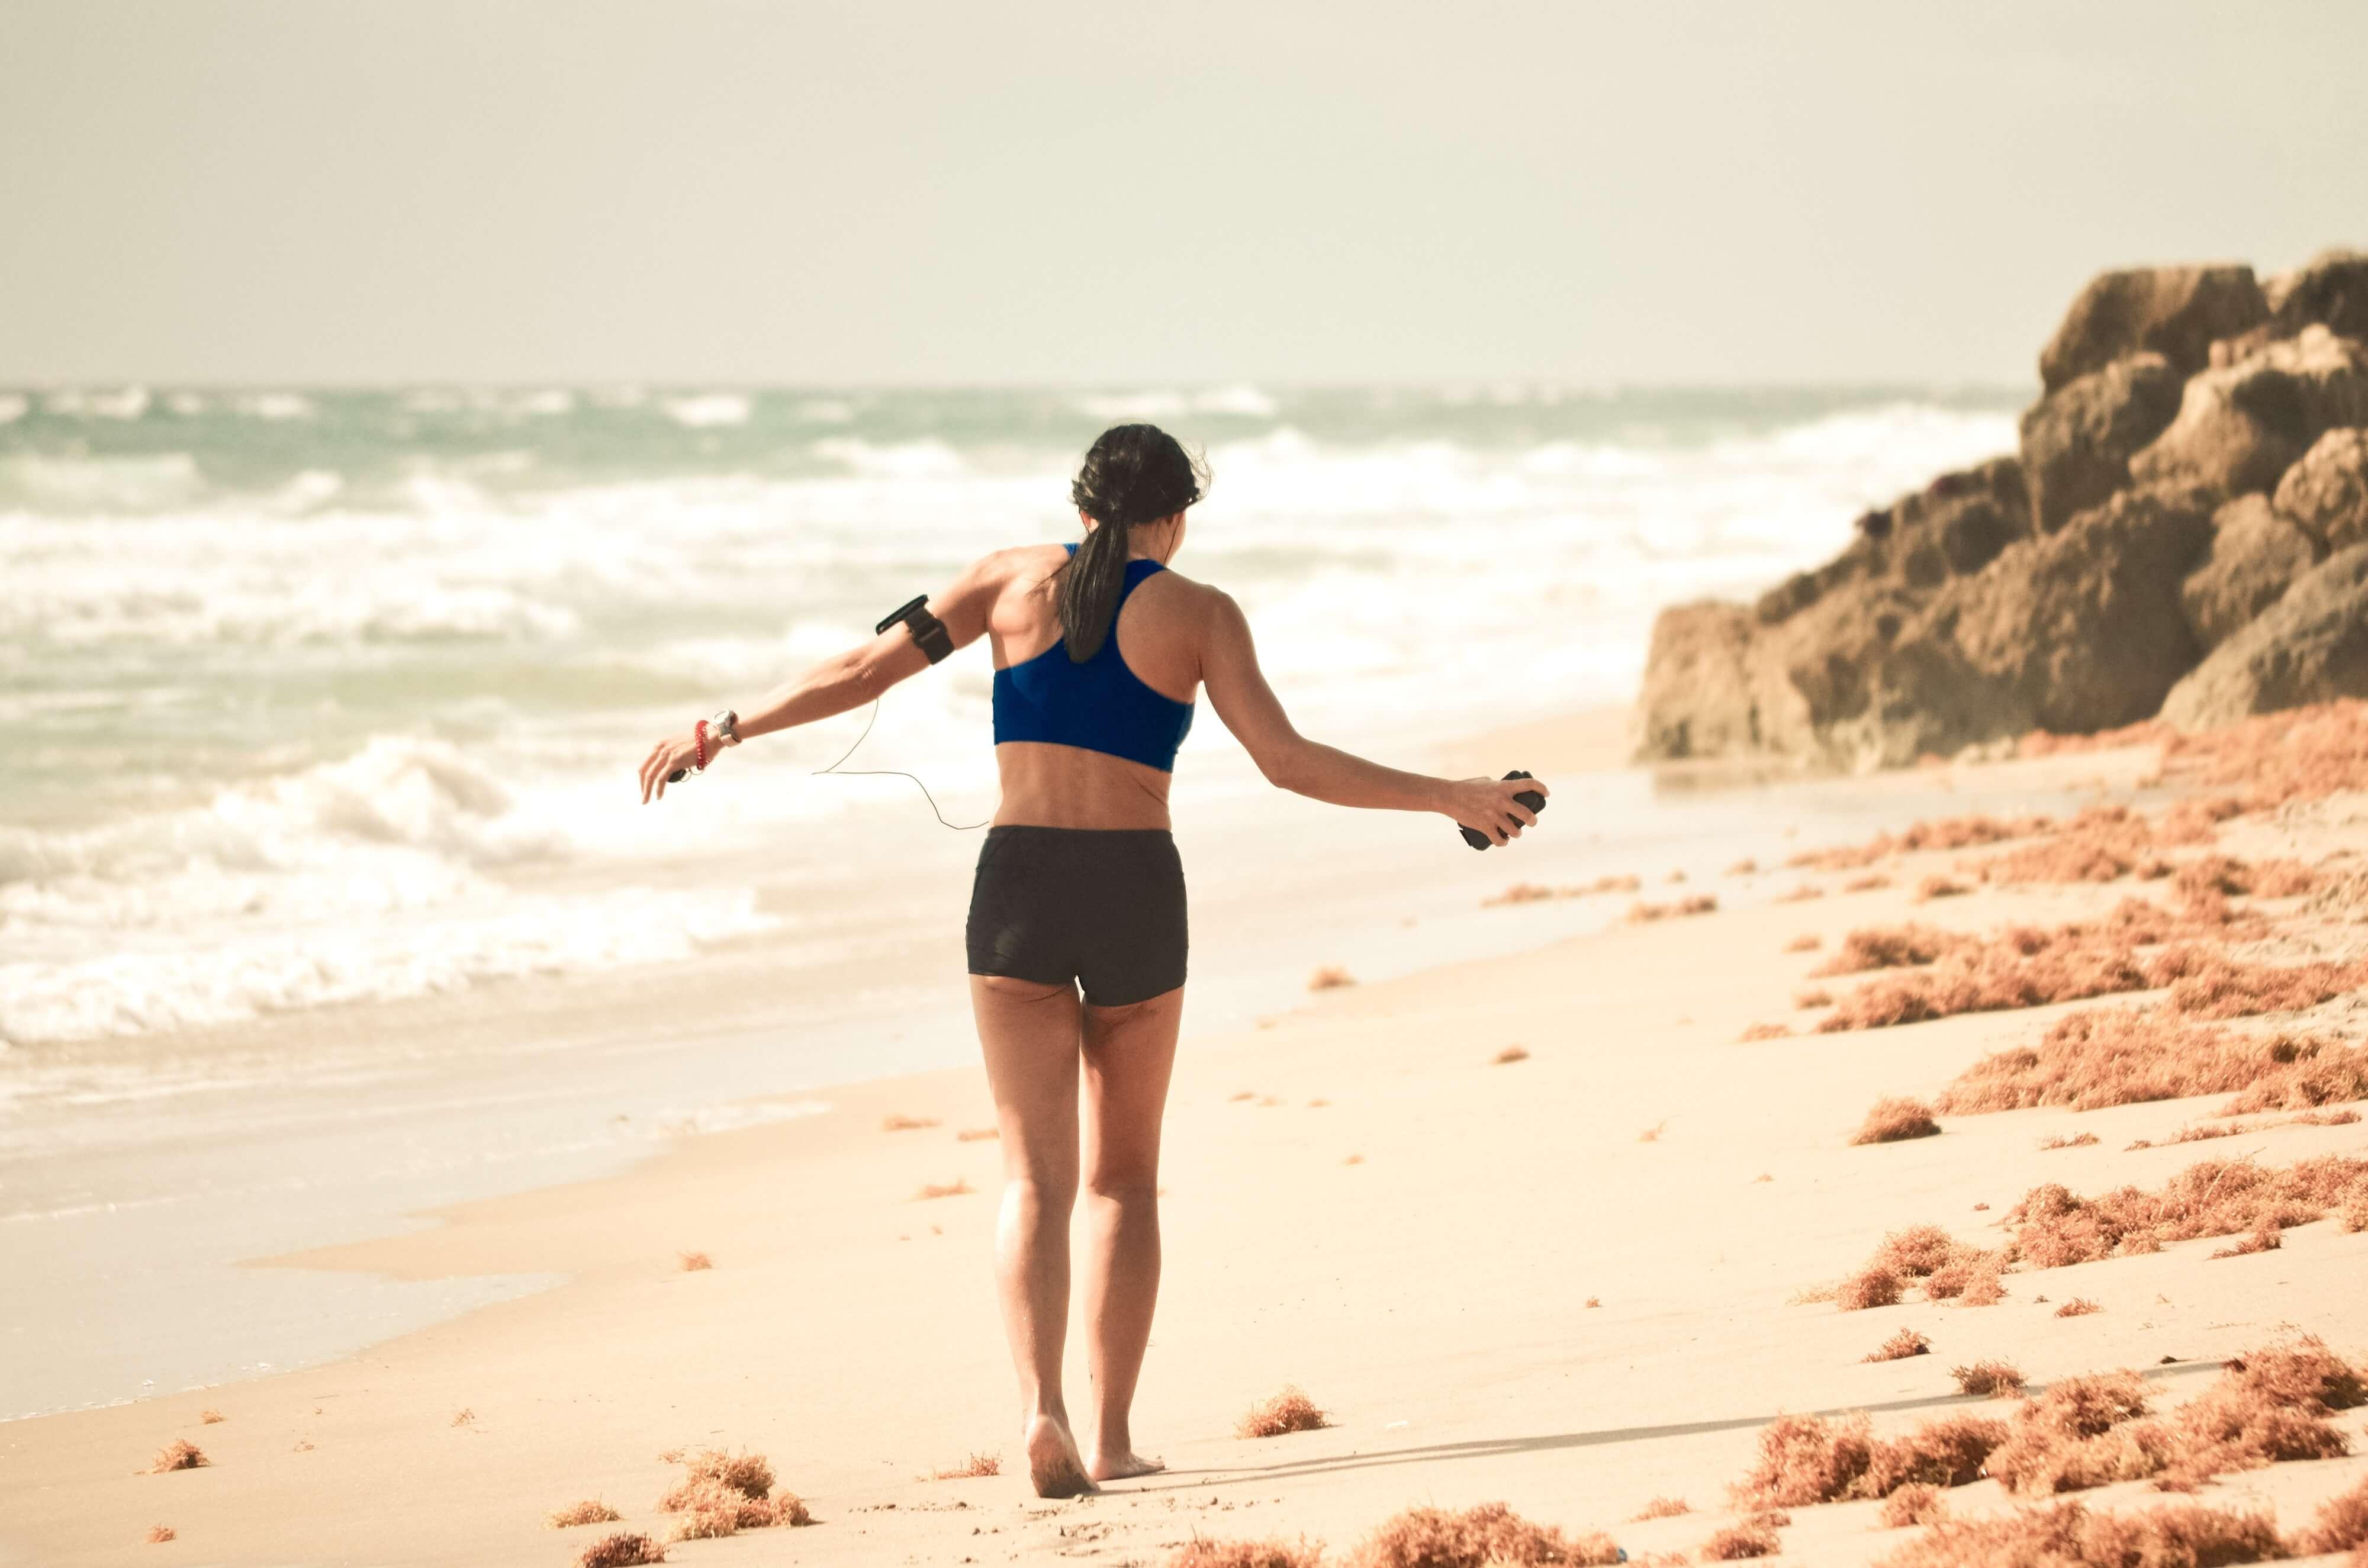 Femme sport plage